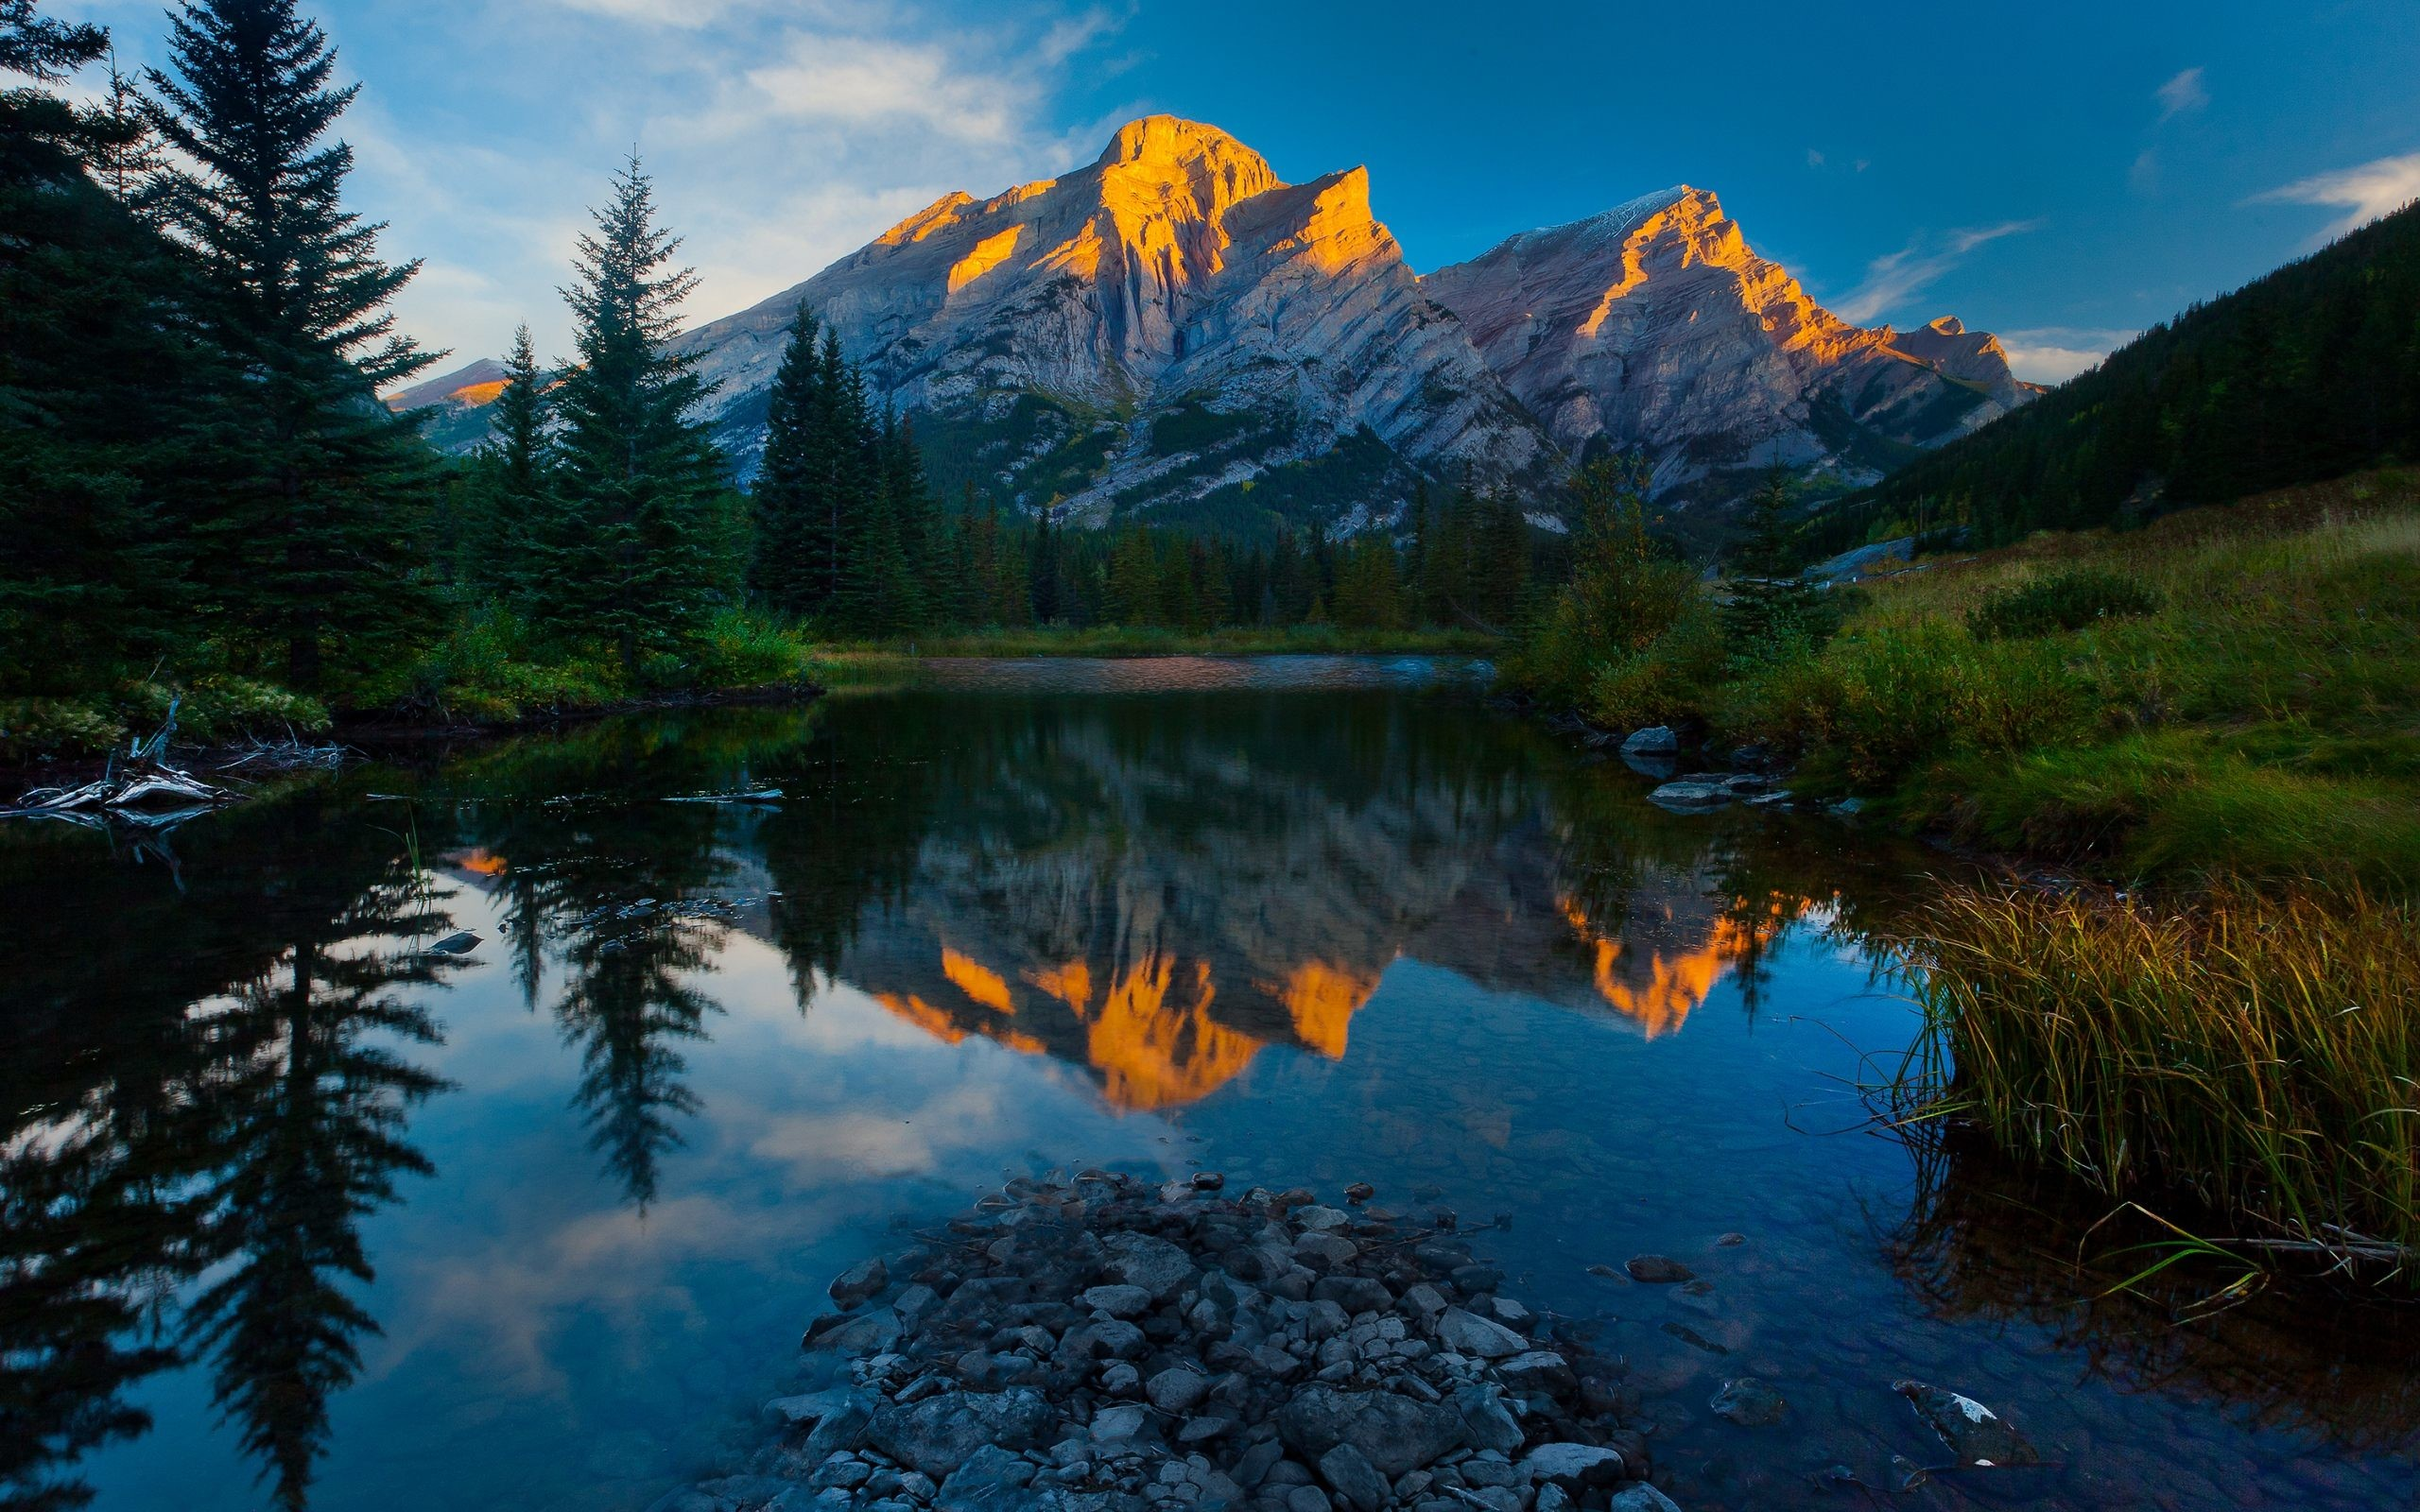 Beautiful Scenery Wallpaper HD Download High Resolution